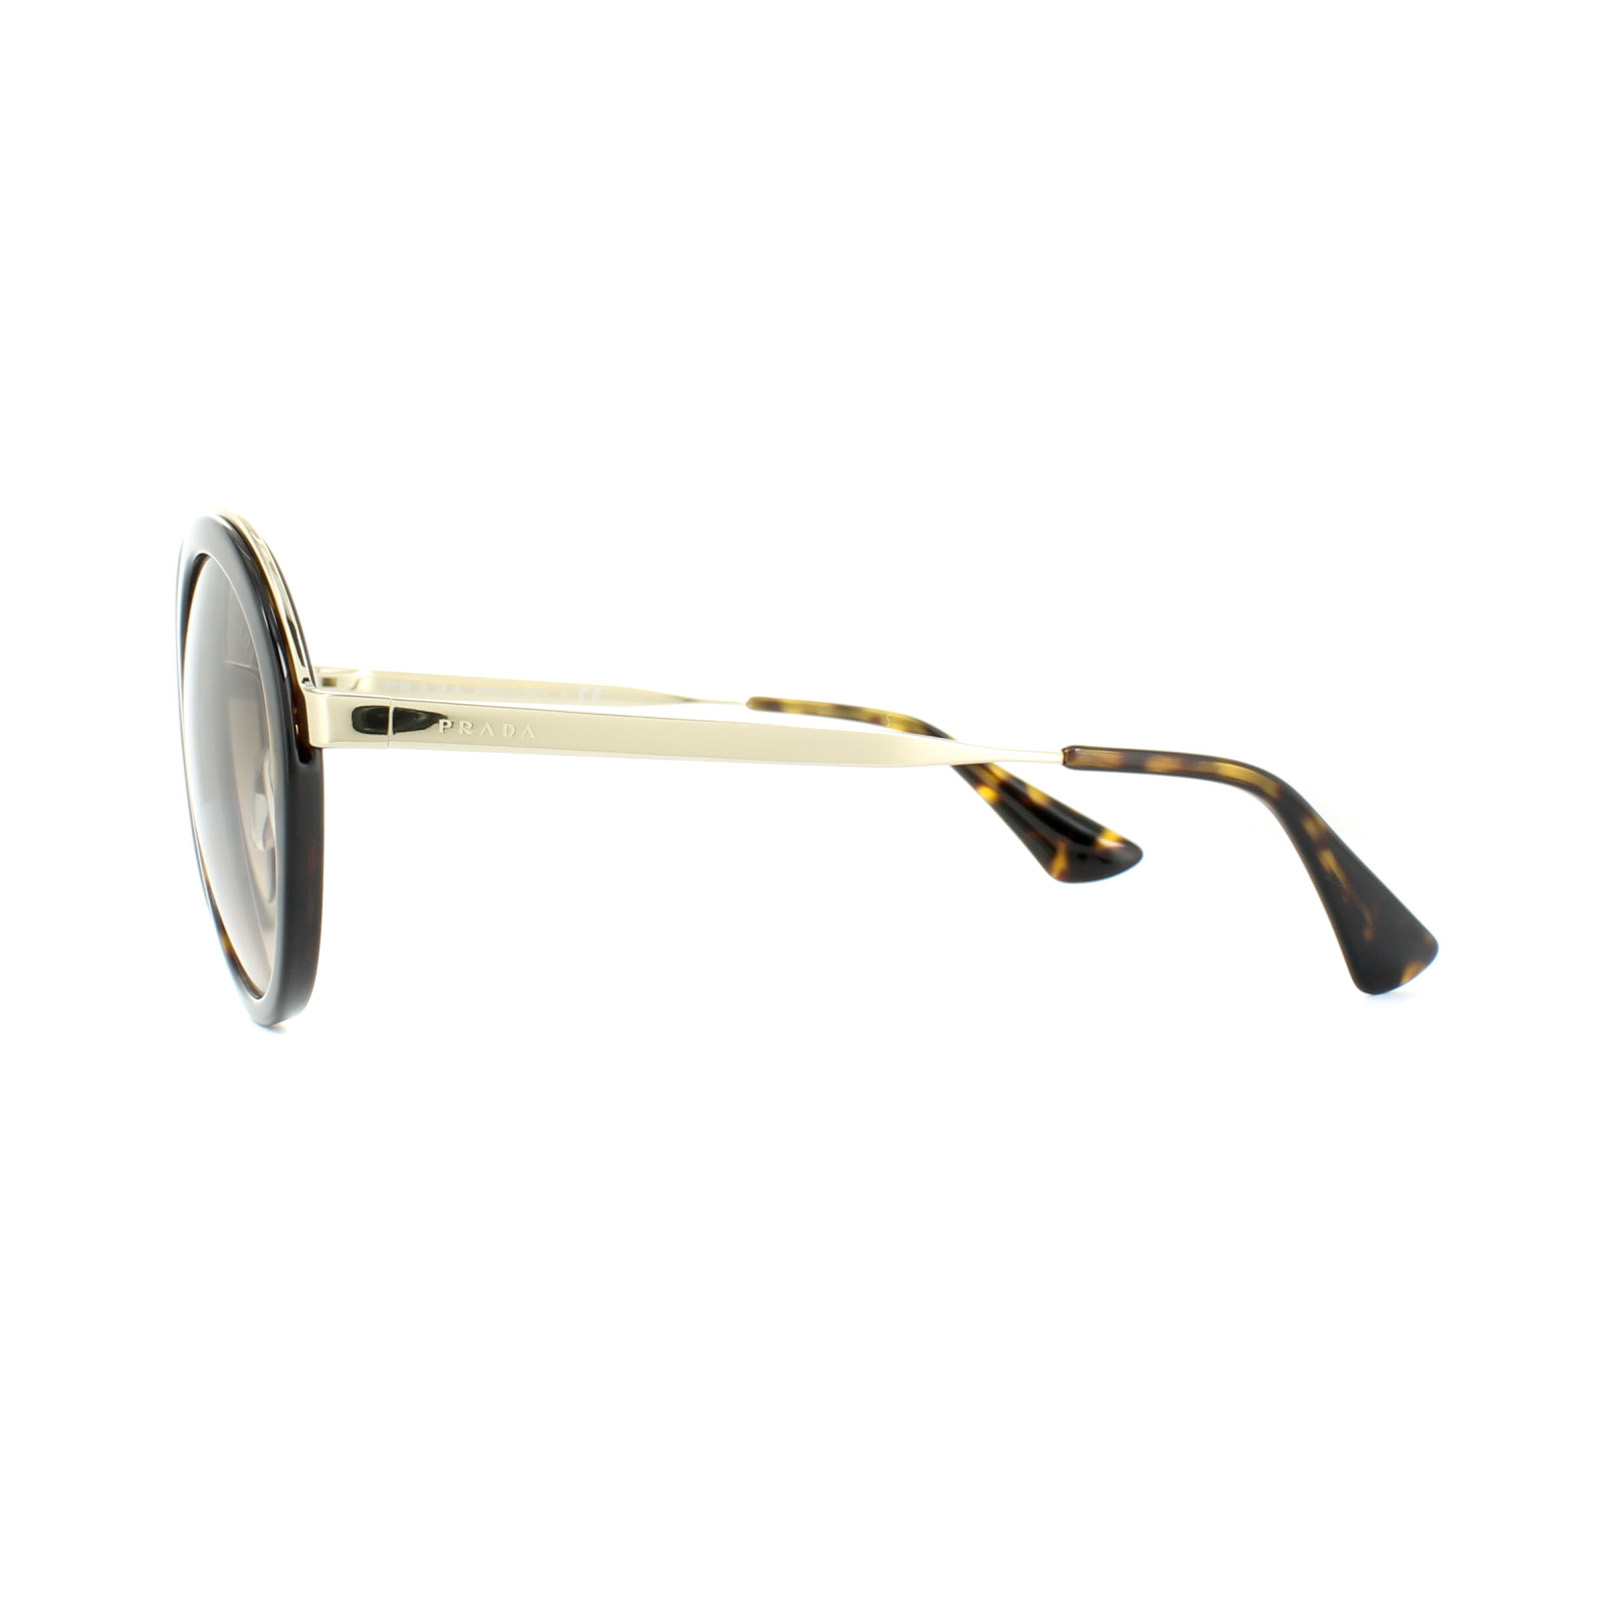 631766c8227c ... canada sentinel prada sunglasses 50ts 2au3d0 havana brown gradient  5eb6b 7768d